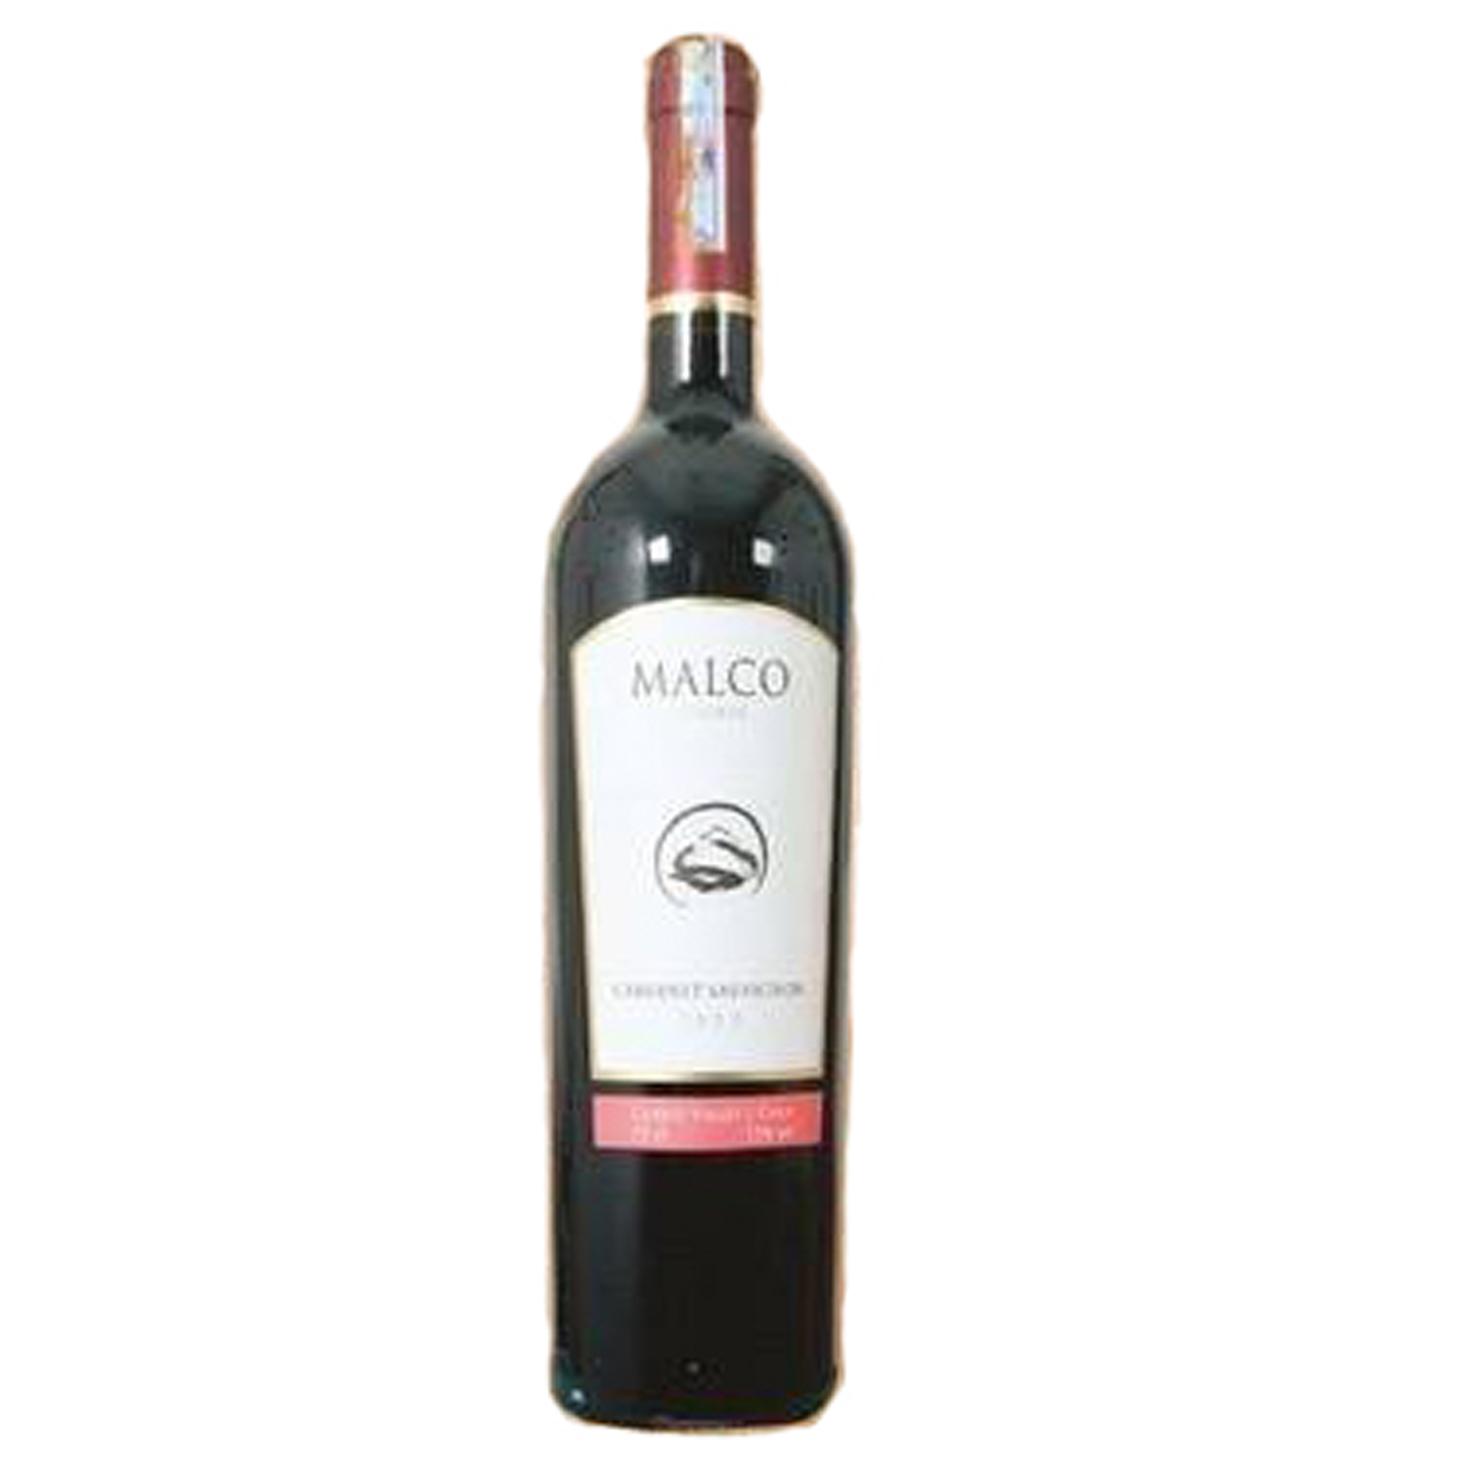 Rượu vang Malco Cabernet Sauvignon